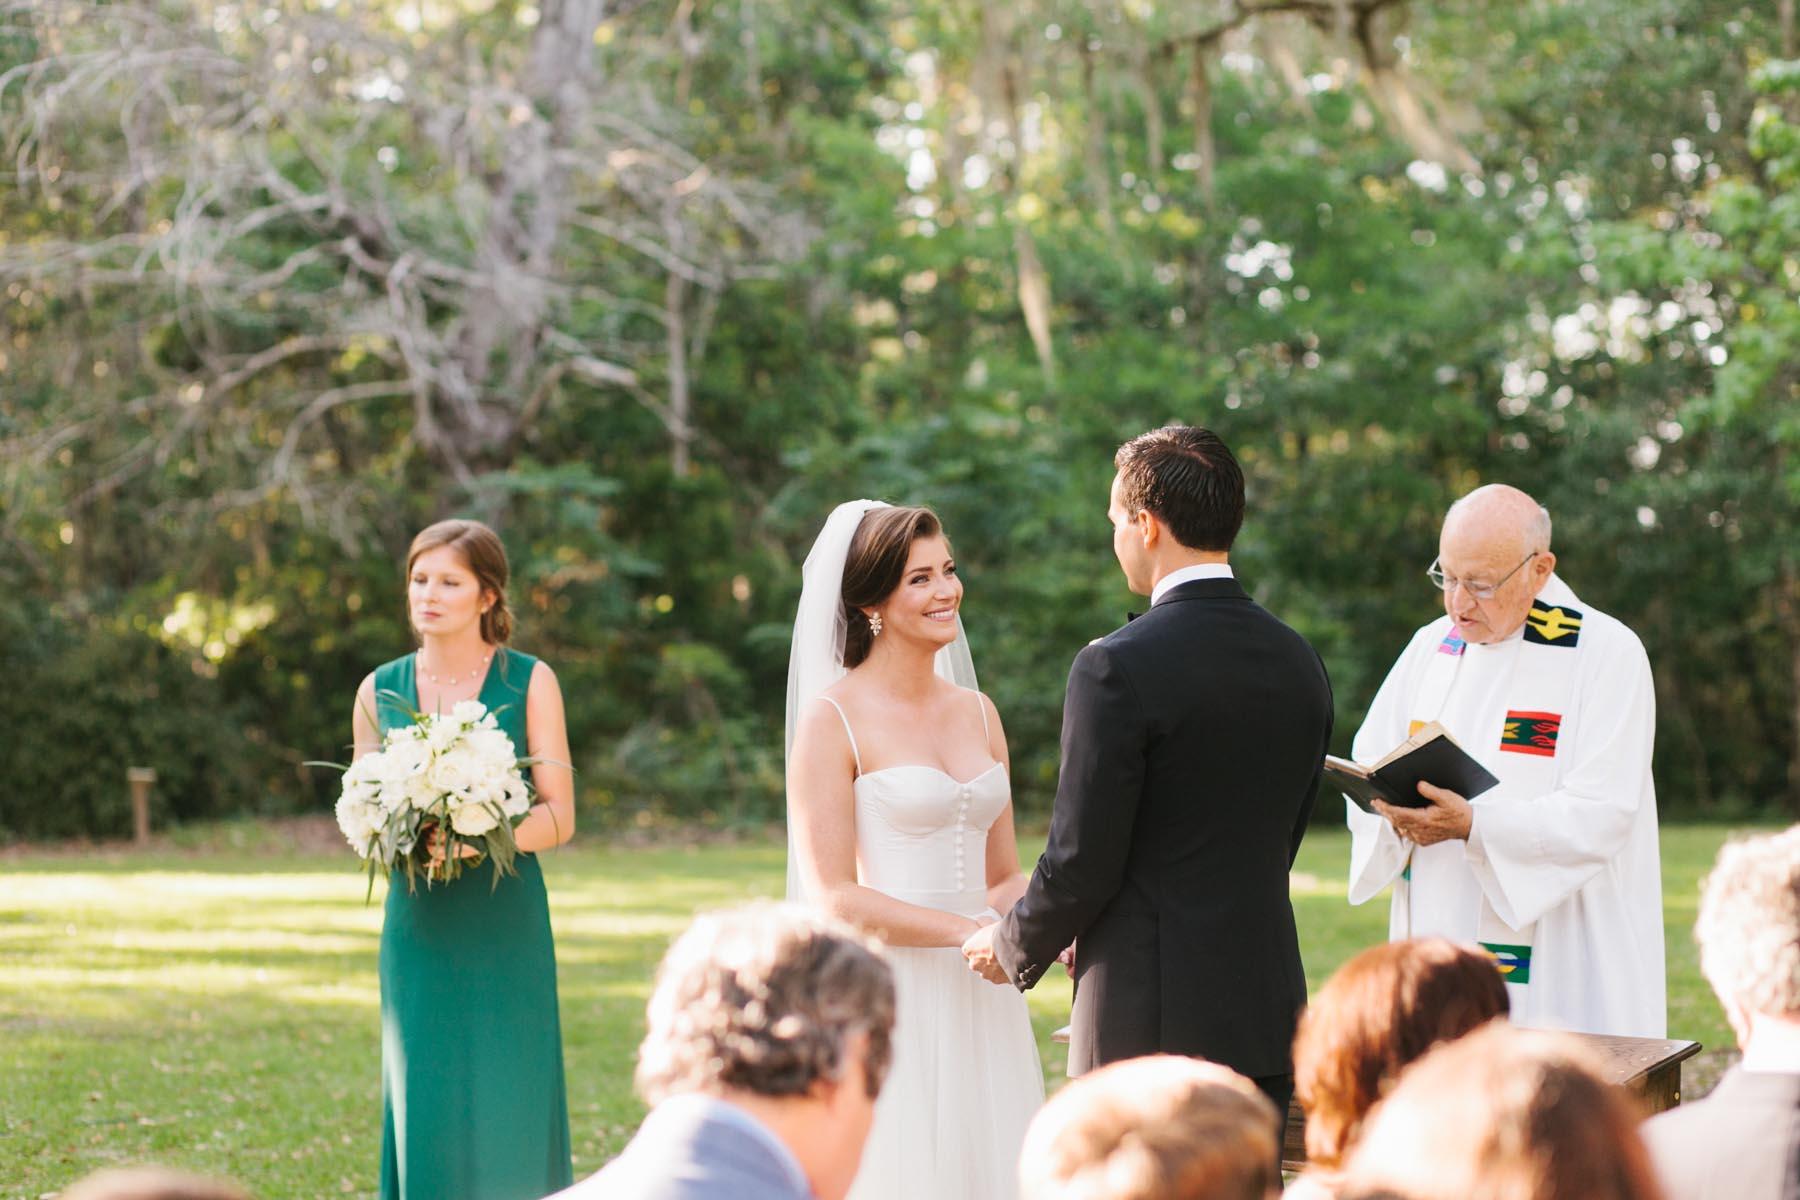 lowry wedding blog eden garden florida wedding-63